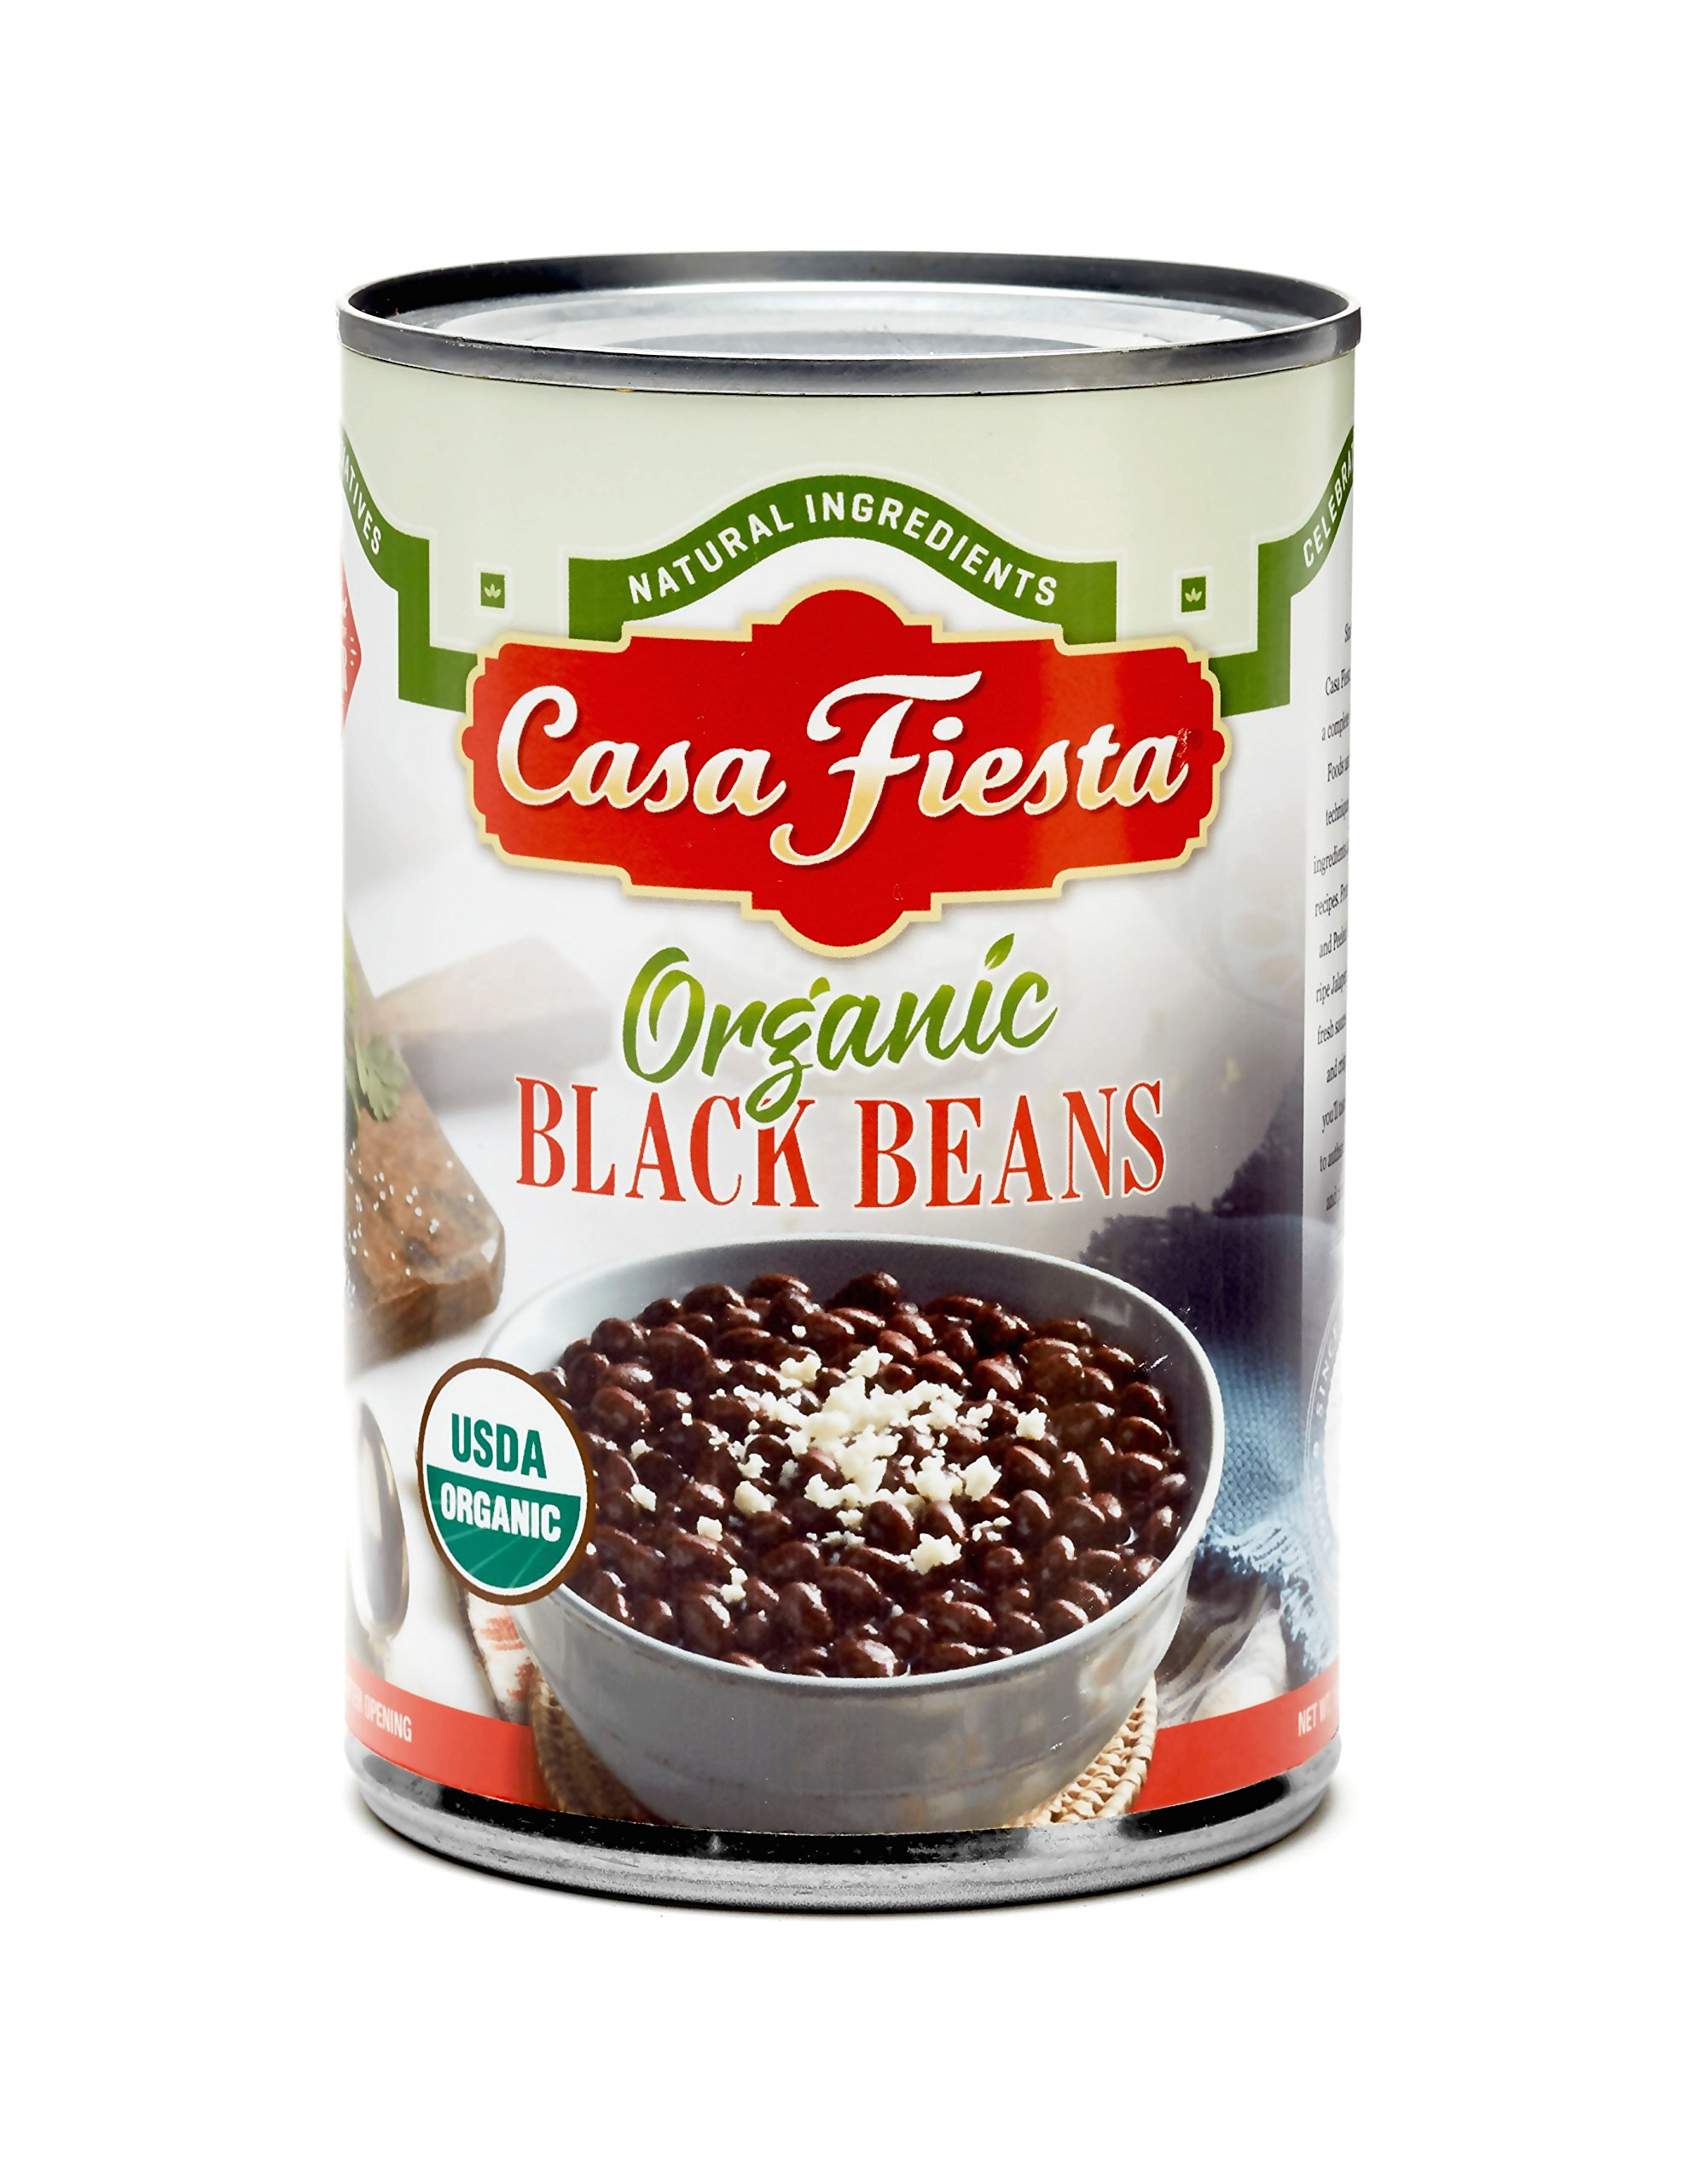 Casa Fiesta Organic Black Beans 15oz 12 pack